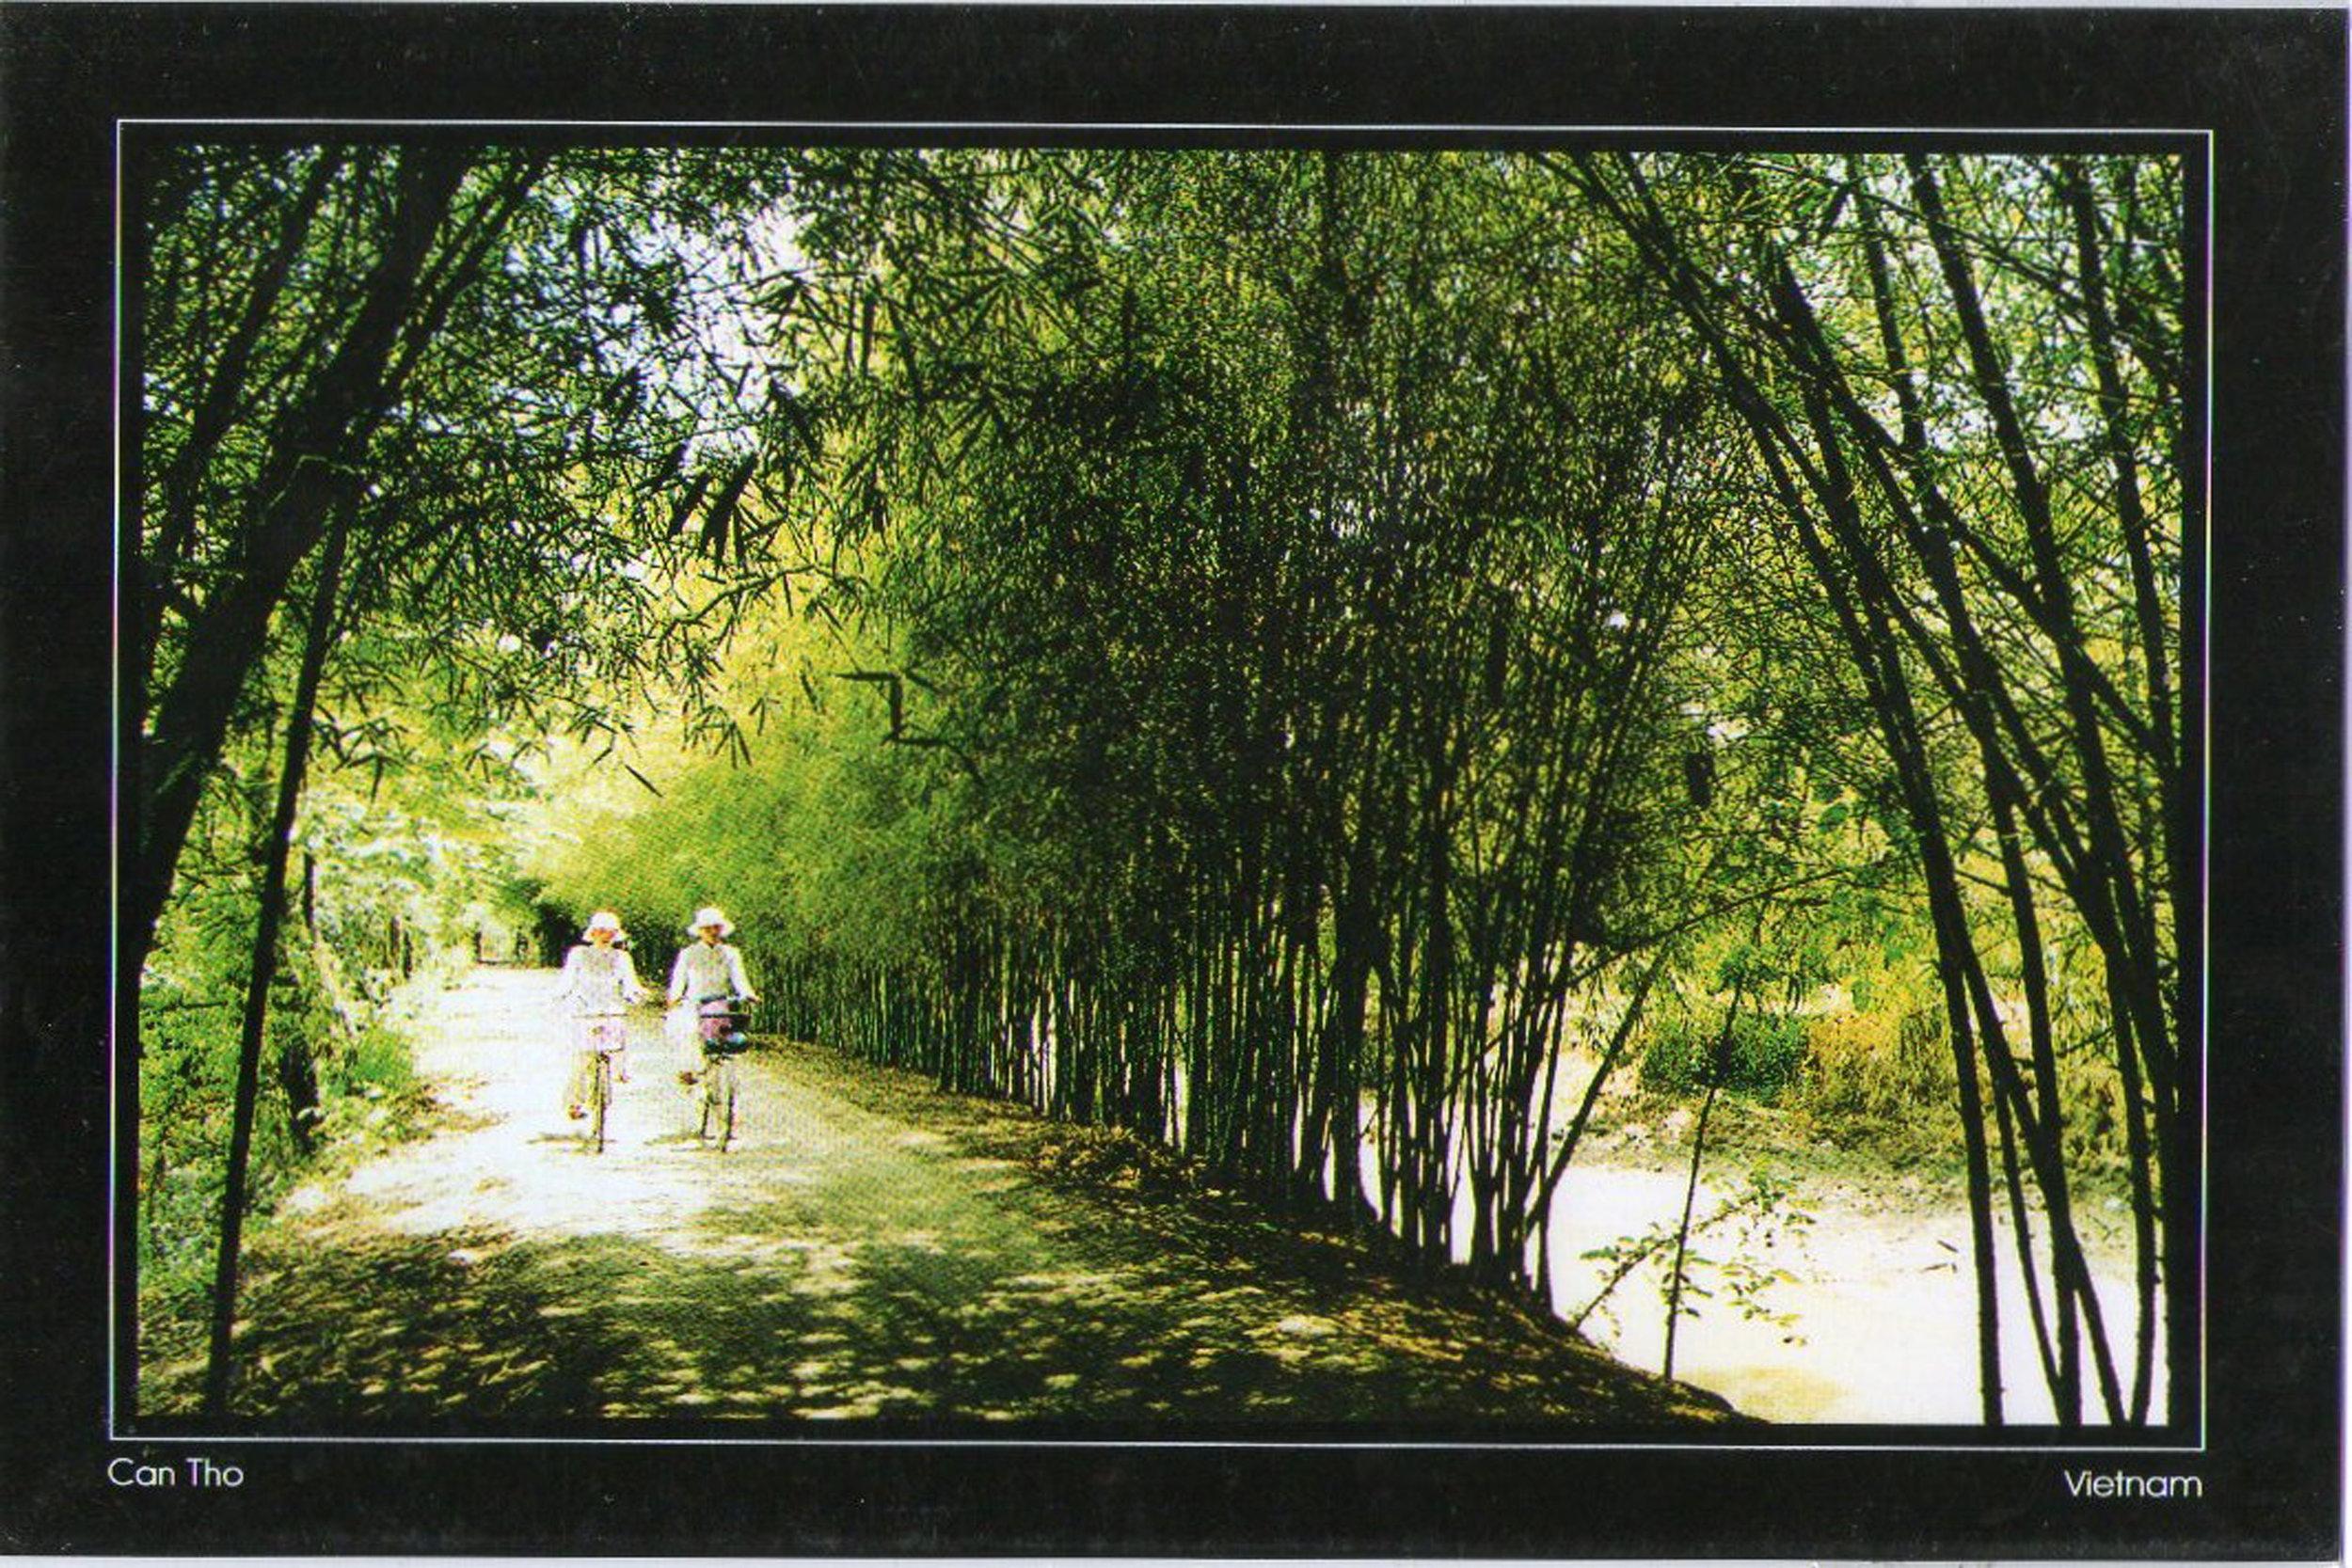 Postcard, Can Tho, Vietnam